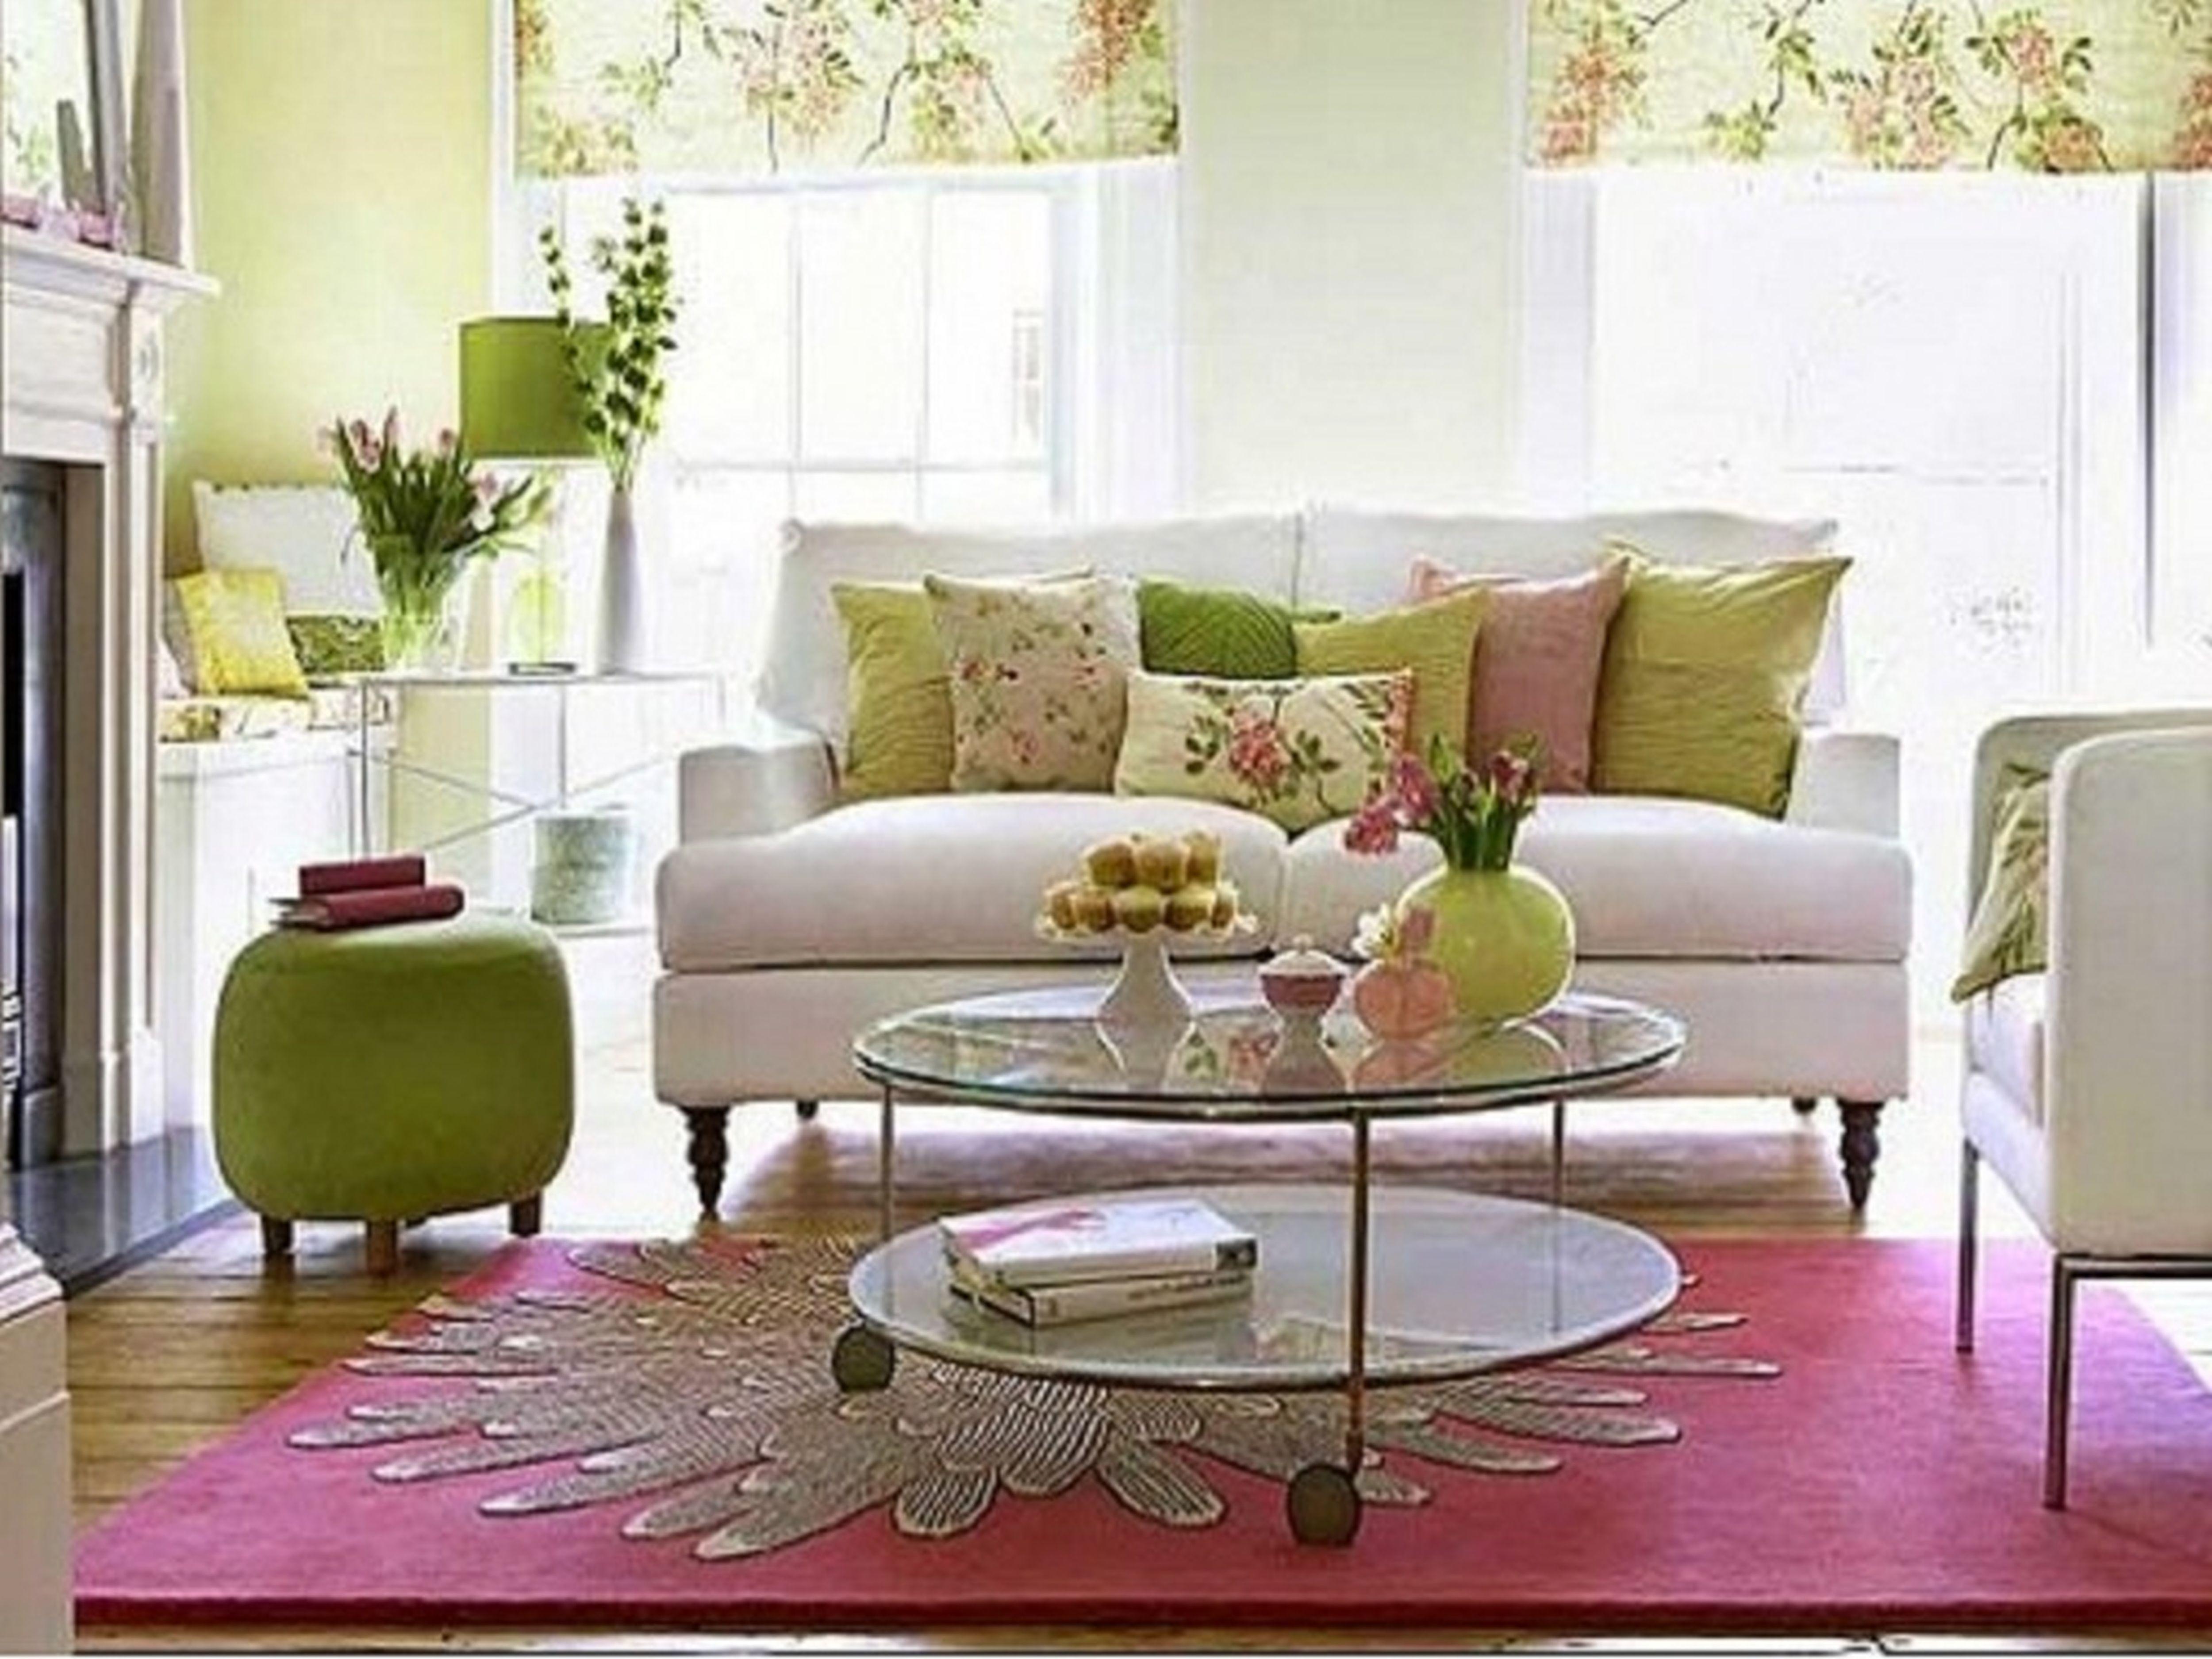 Interior Design 101 5 Interior Design Styles You Should